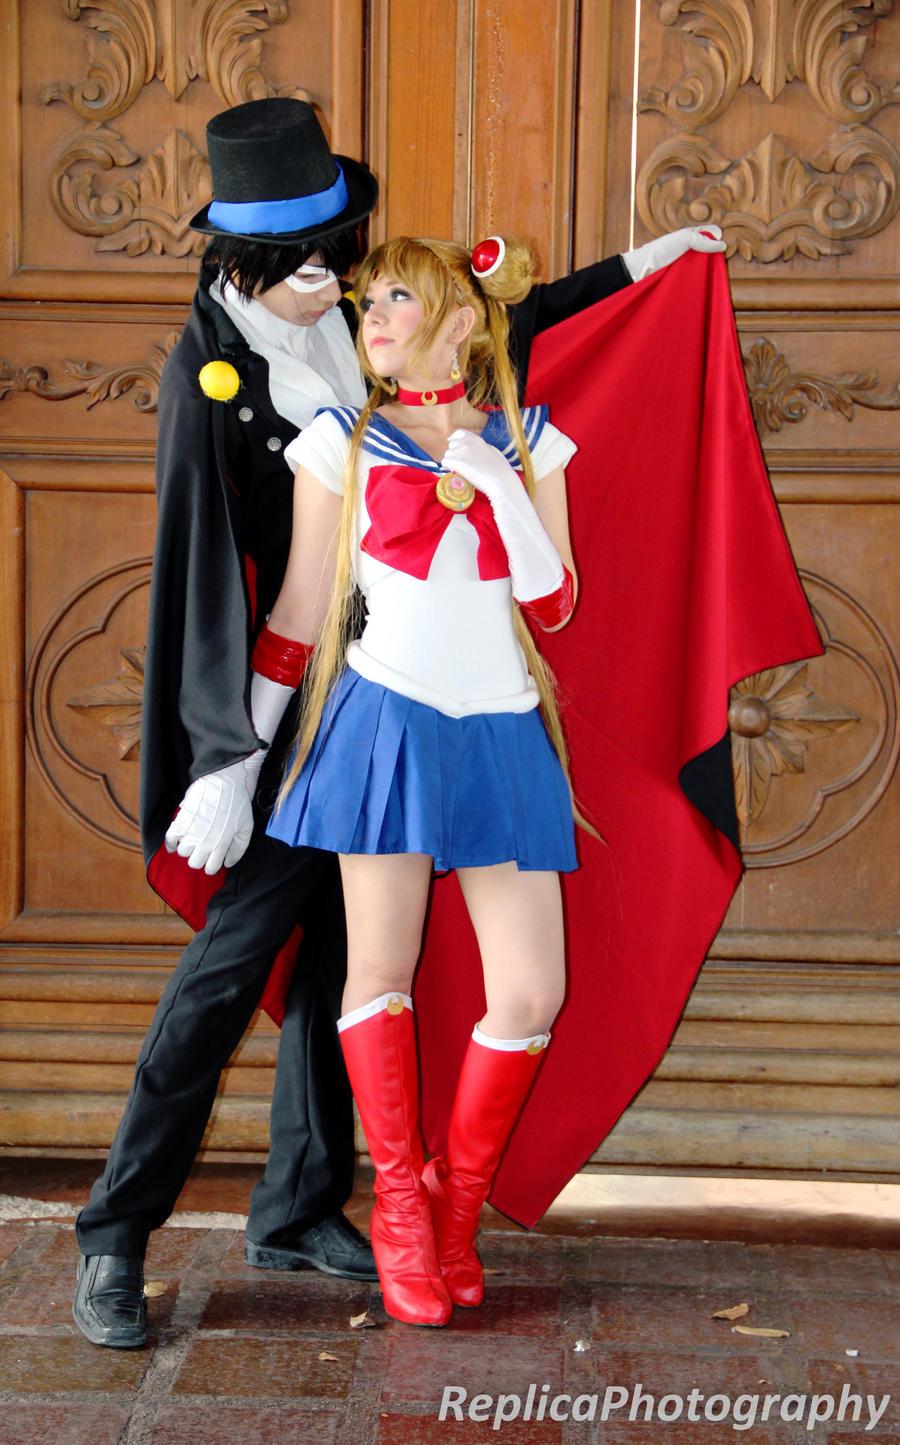 Anime Couple Costumes Wonder Woman Movie Wonder Woman Adult